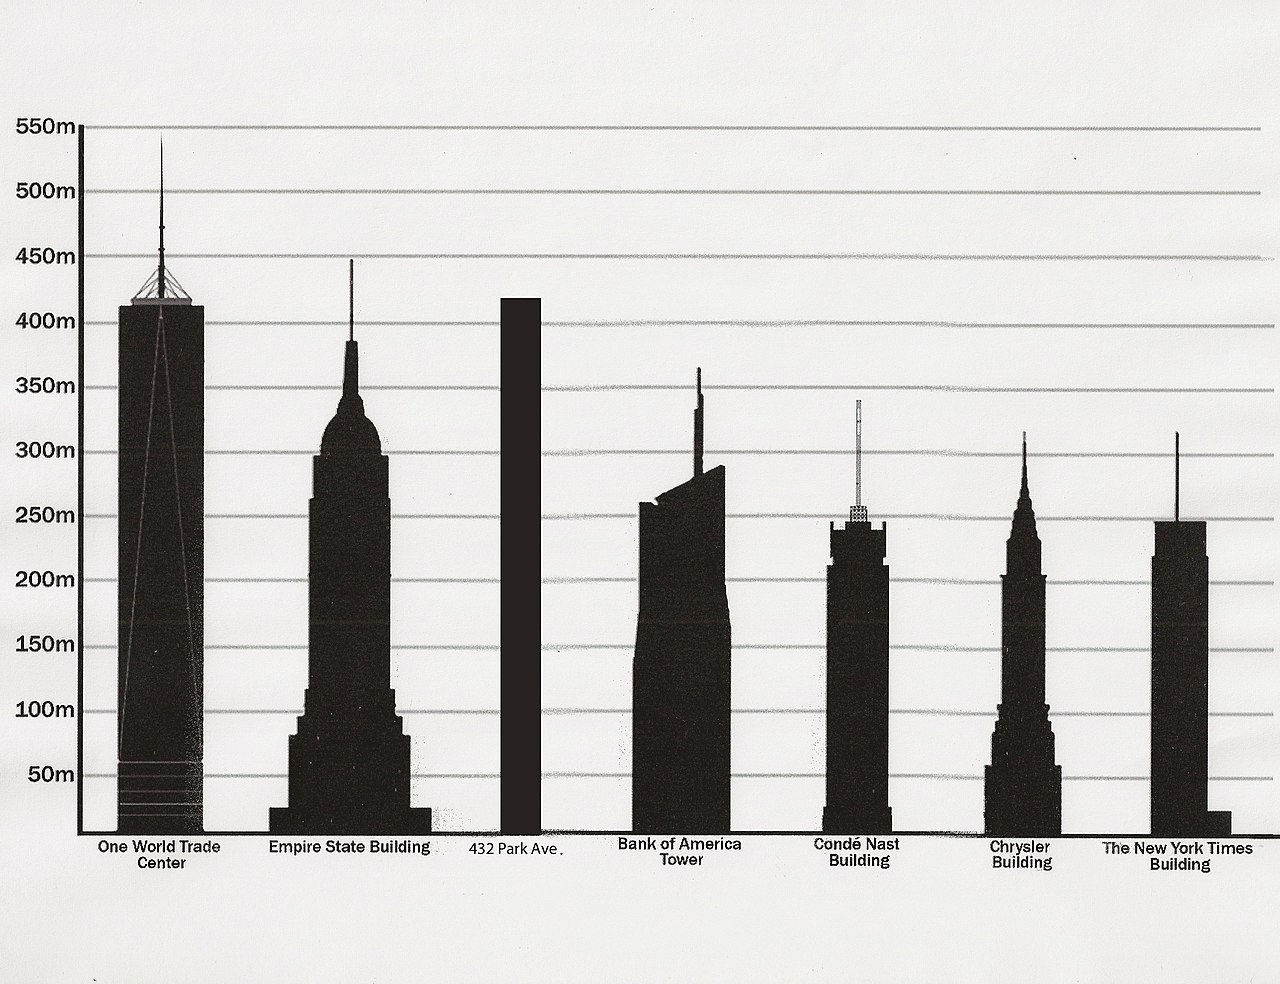 File Tallest Buildings In New York By Pinnacle Height 2